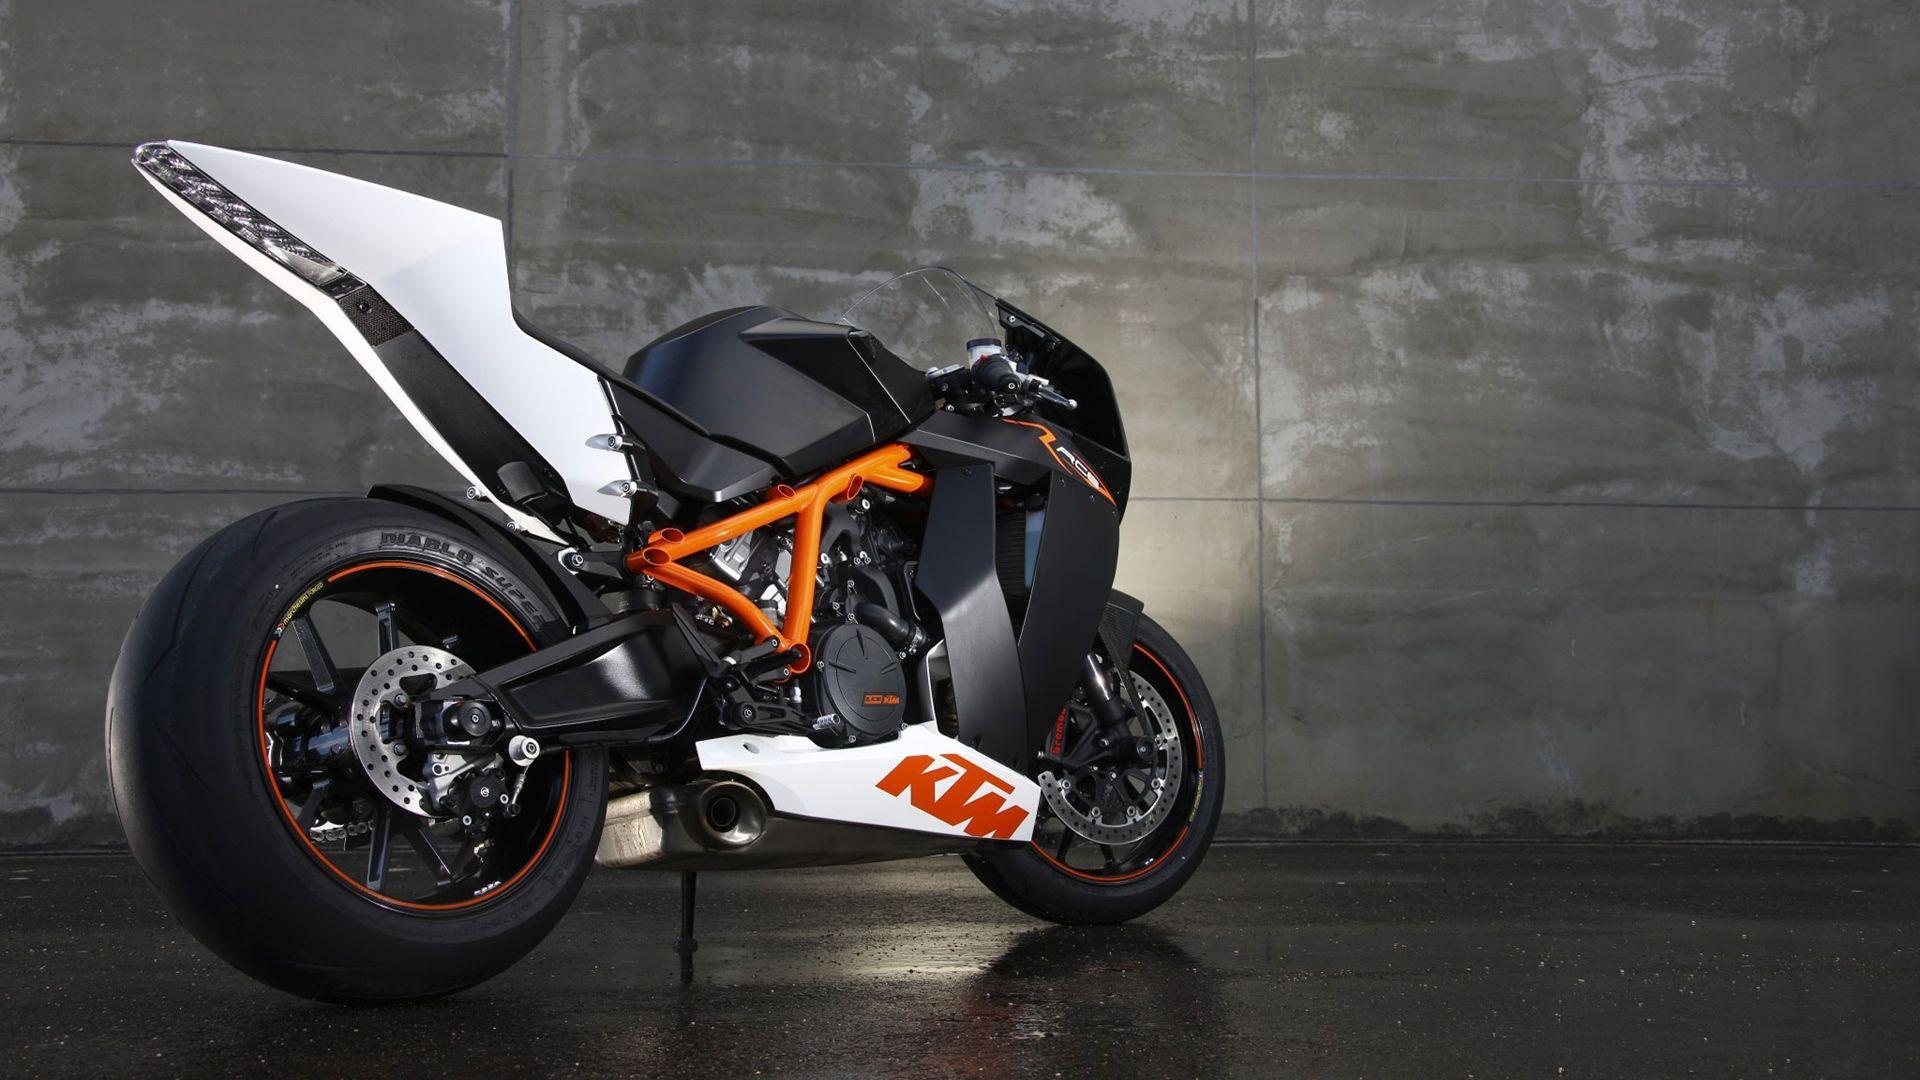 Beautiful Motorcycle Ktm Rc8 Motorcycle Wallpaper Ktm